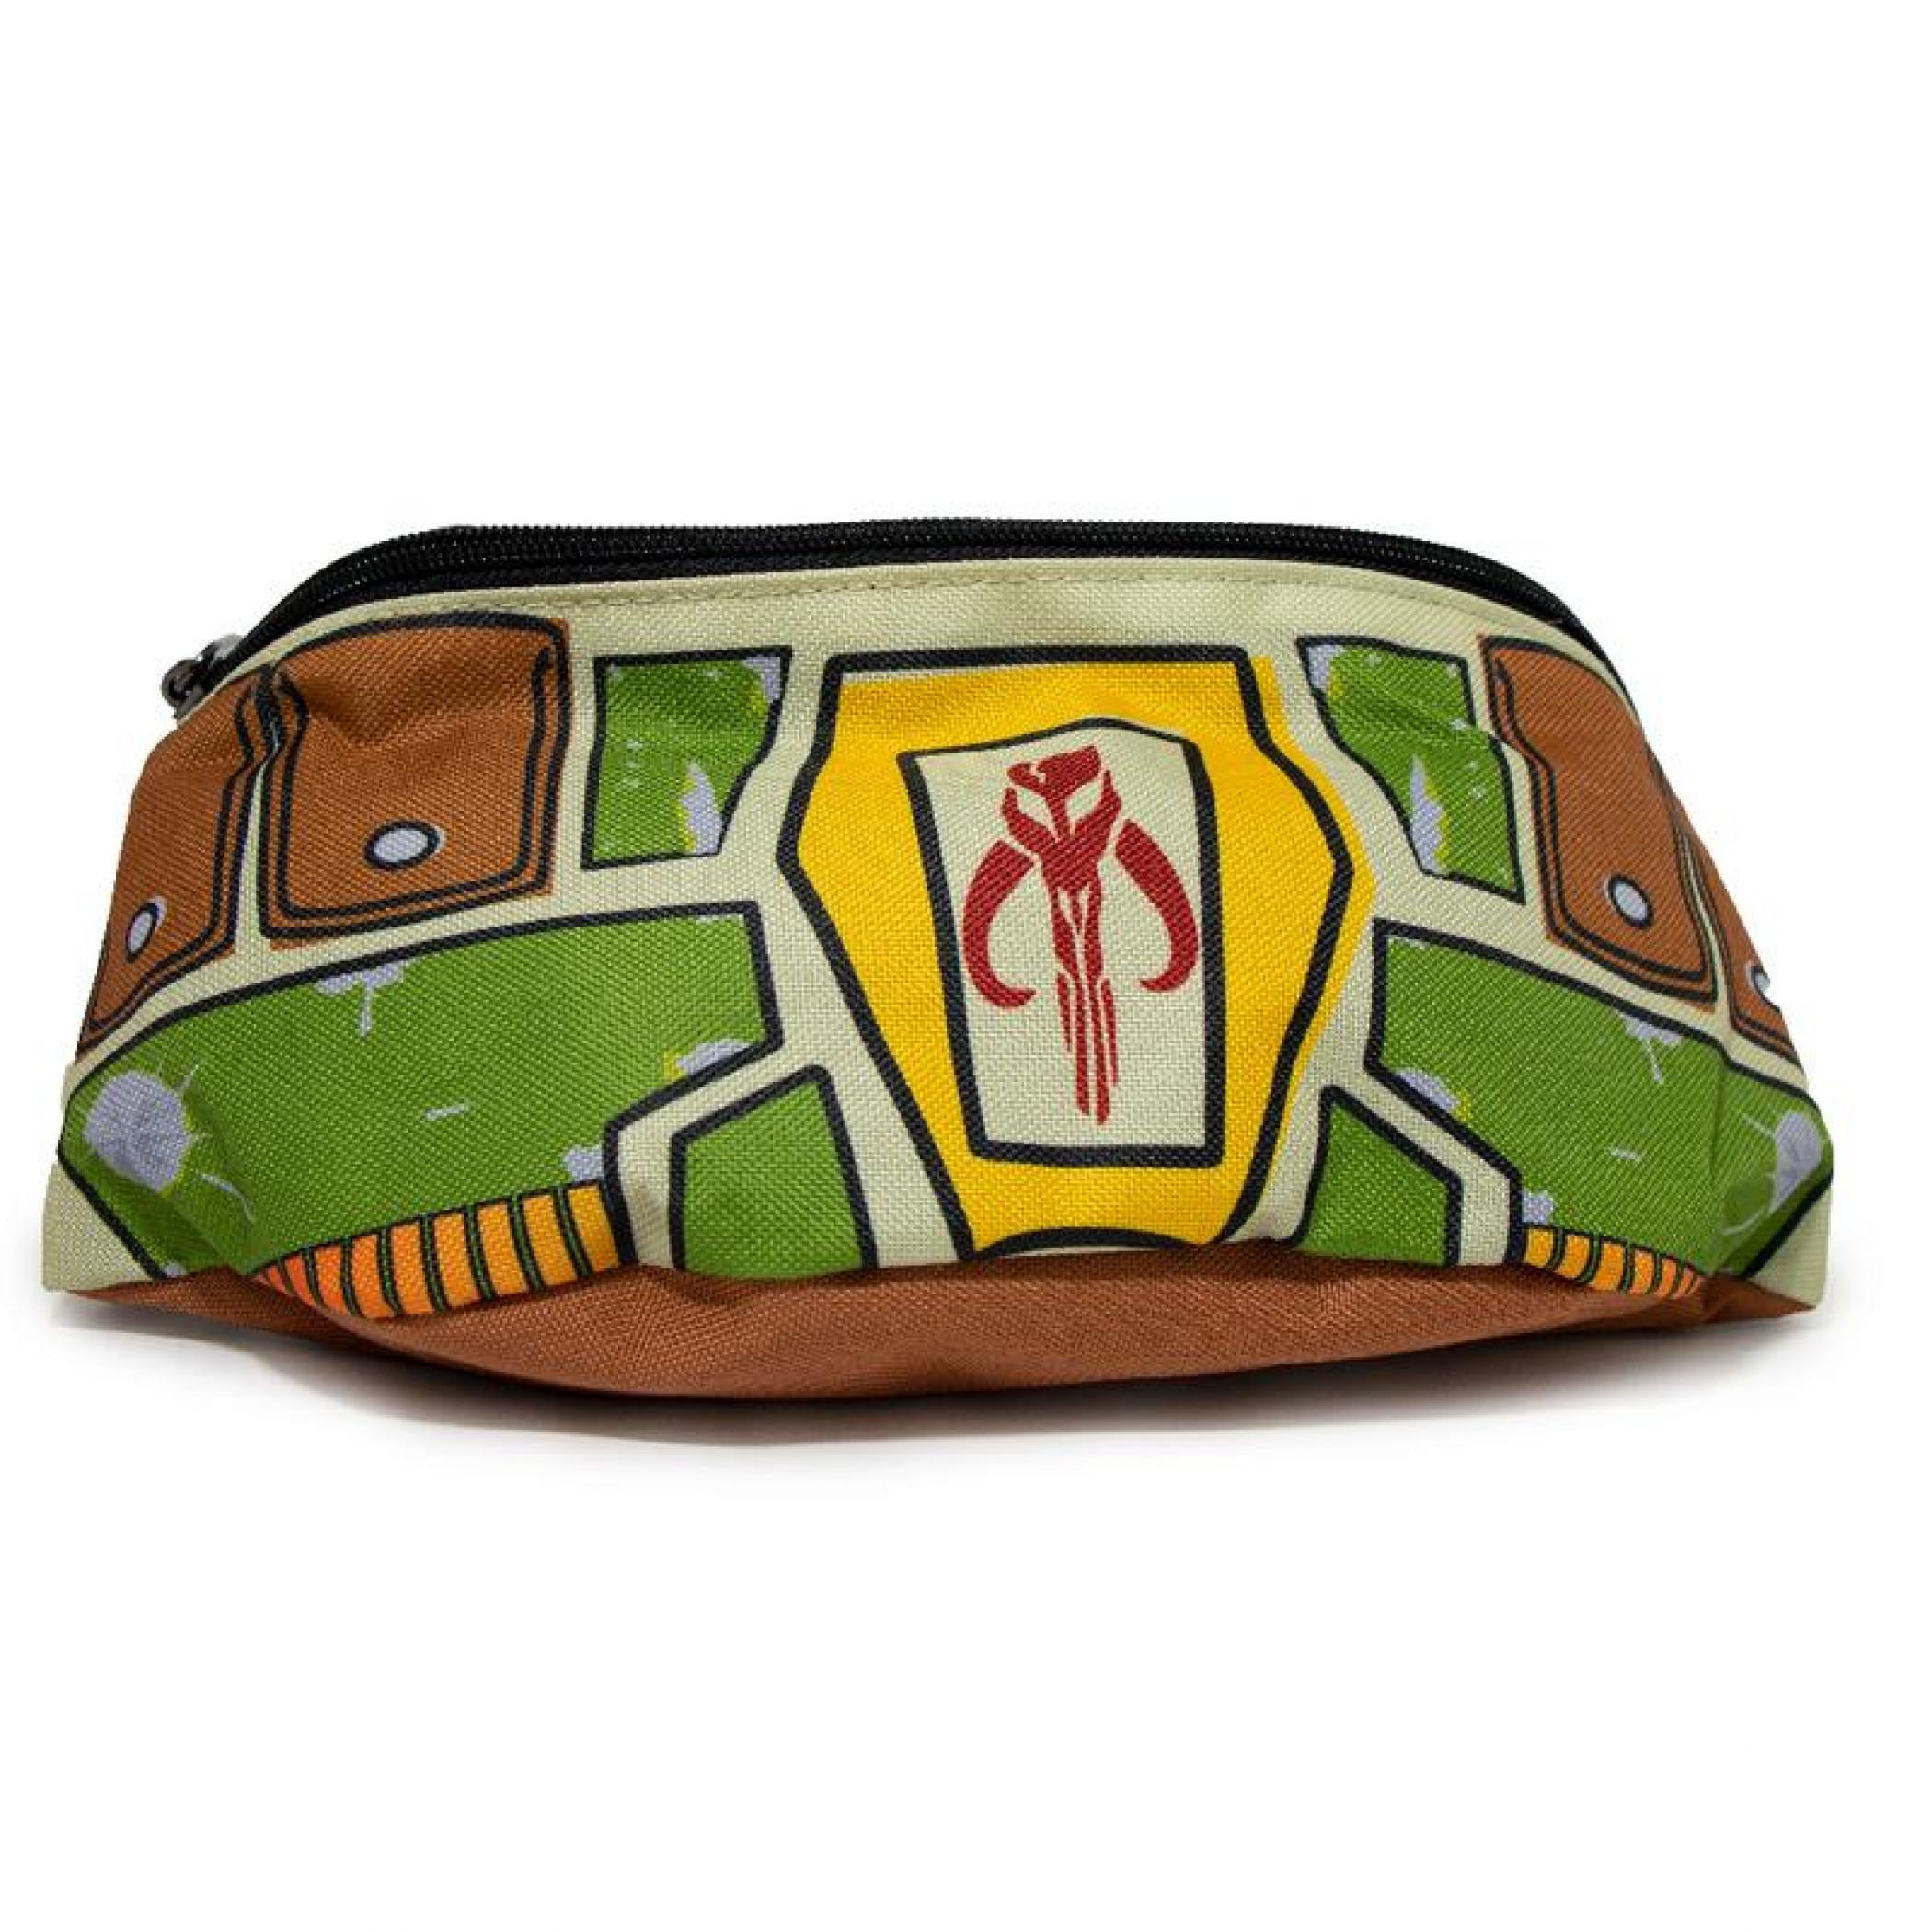 Star Wars Boba Fett Utility Belt Fanny Pack